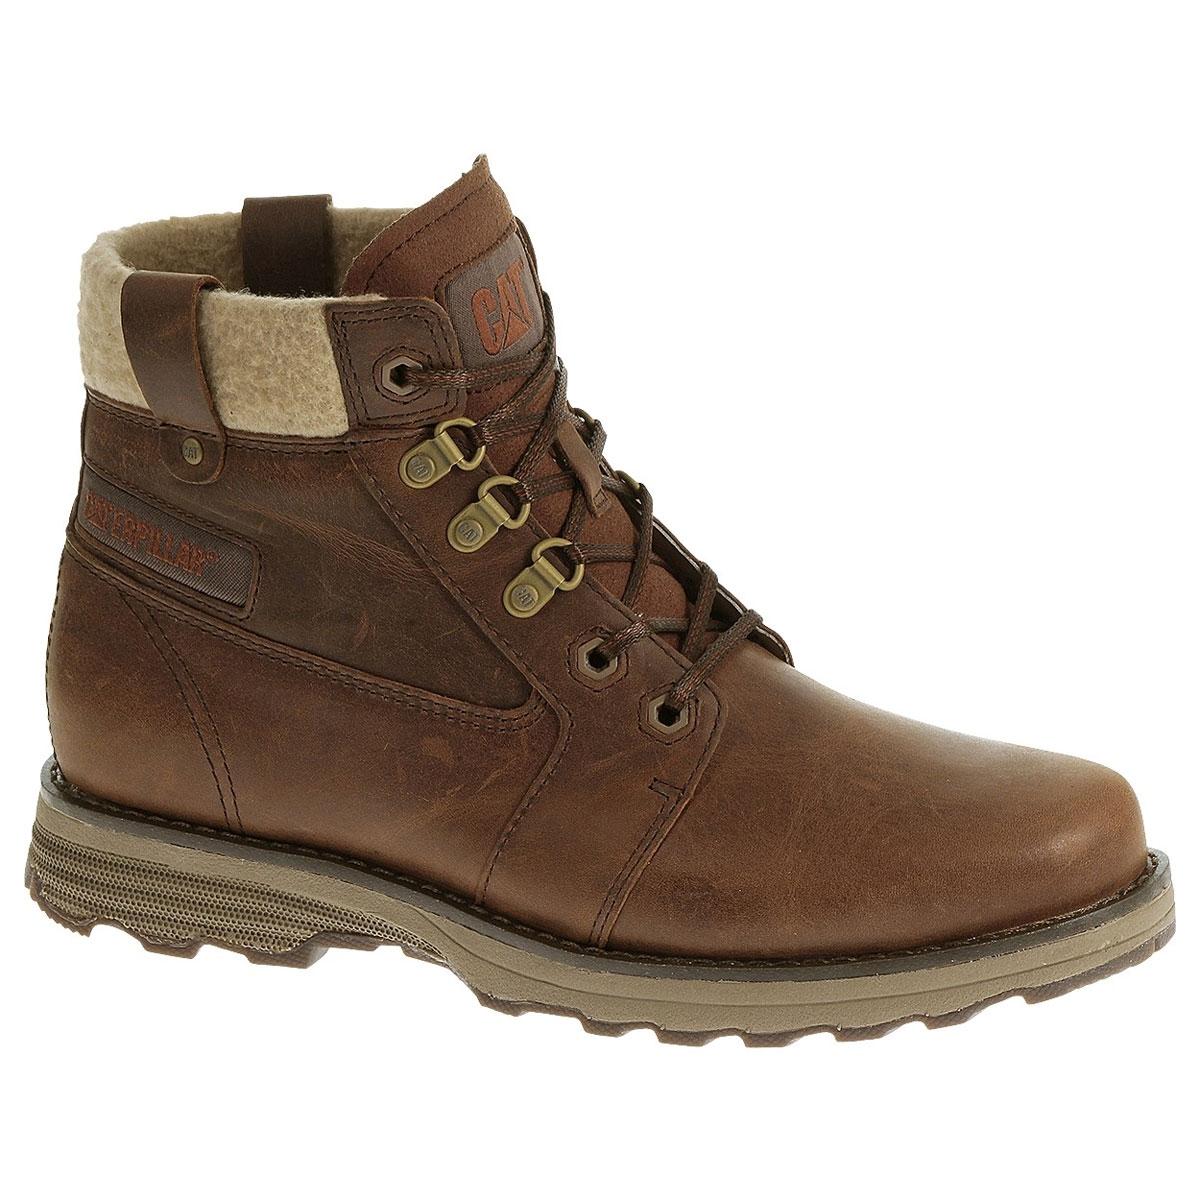 Popular Cat Footwear Womens Misa Boots In Peanut Leather  Orstyleblog